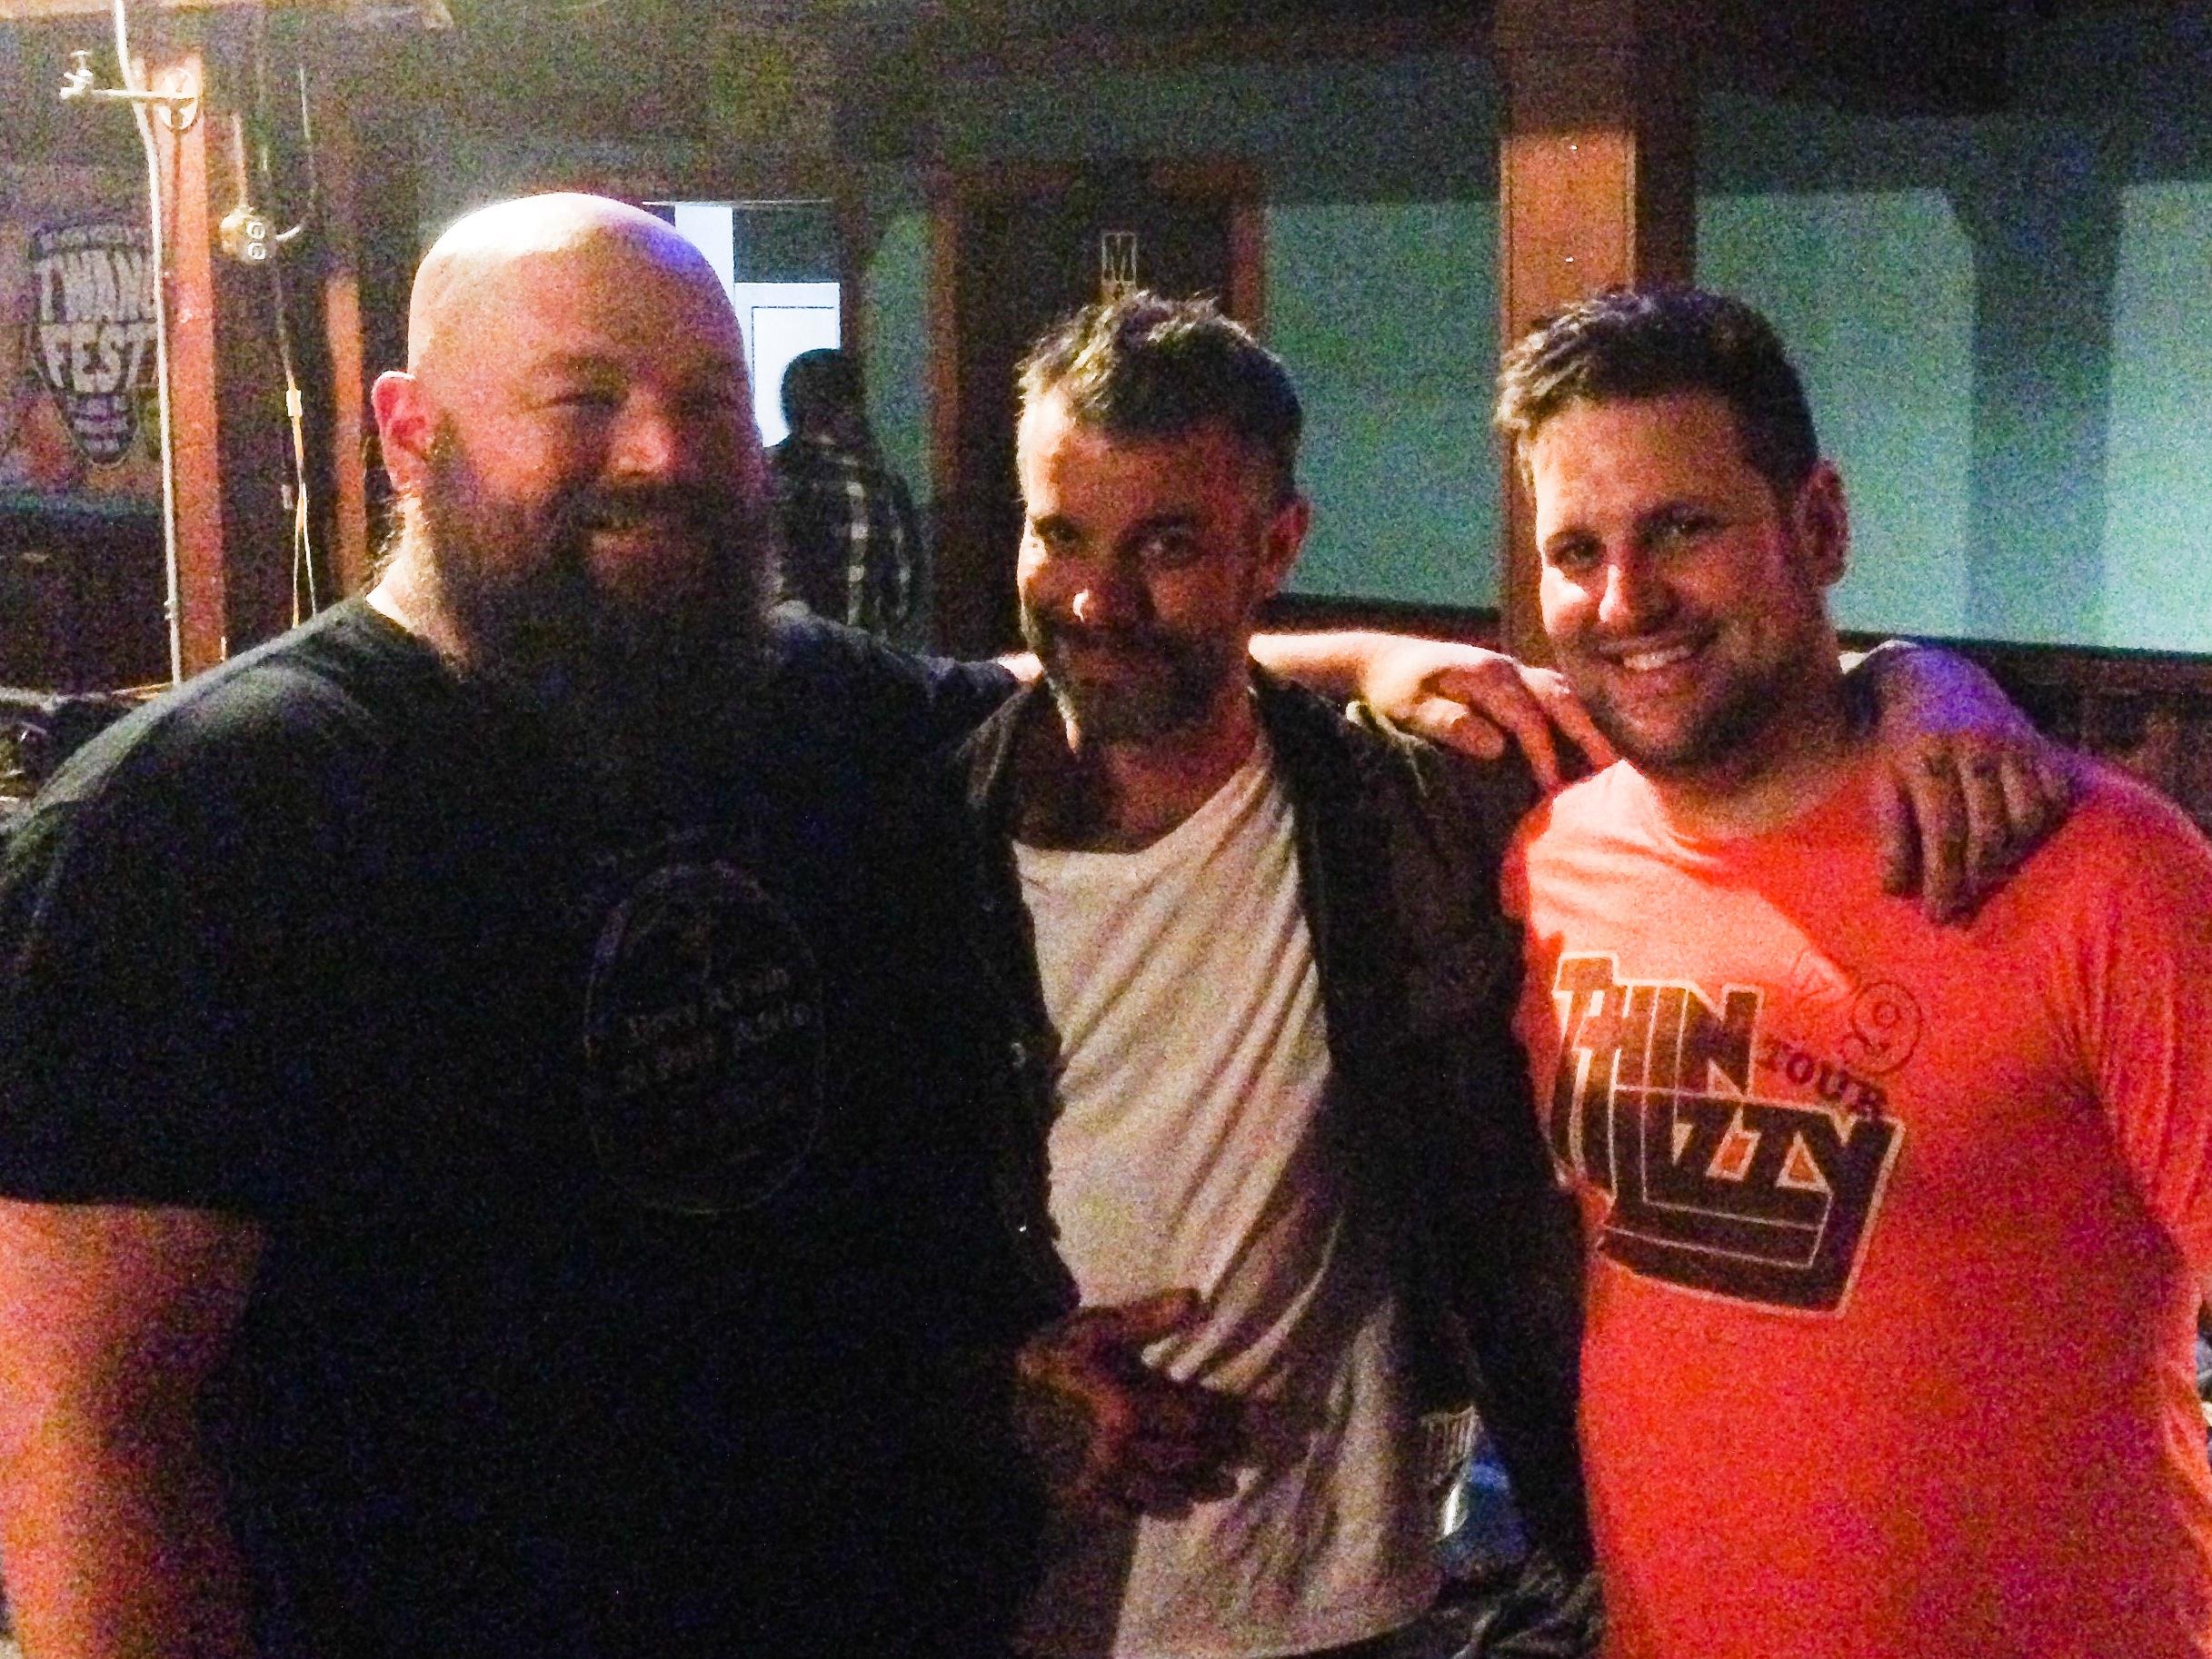 Bart, Ben, and Jeff